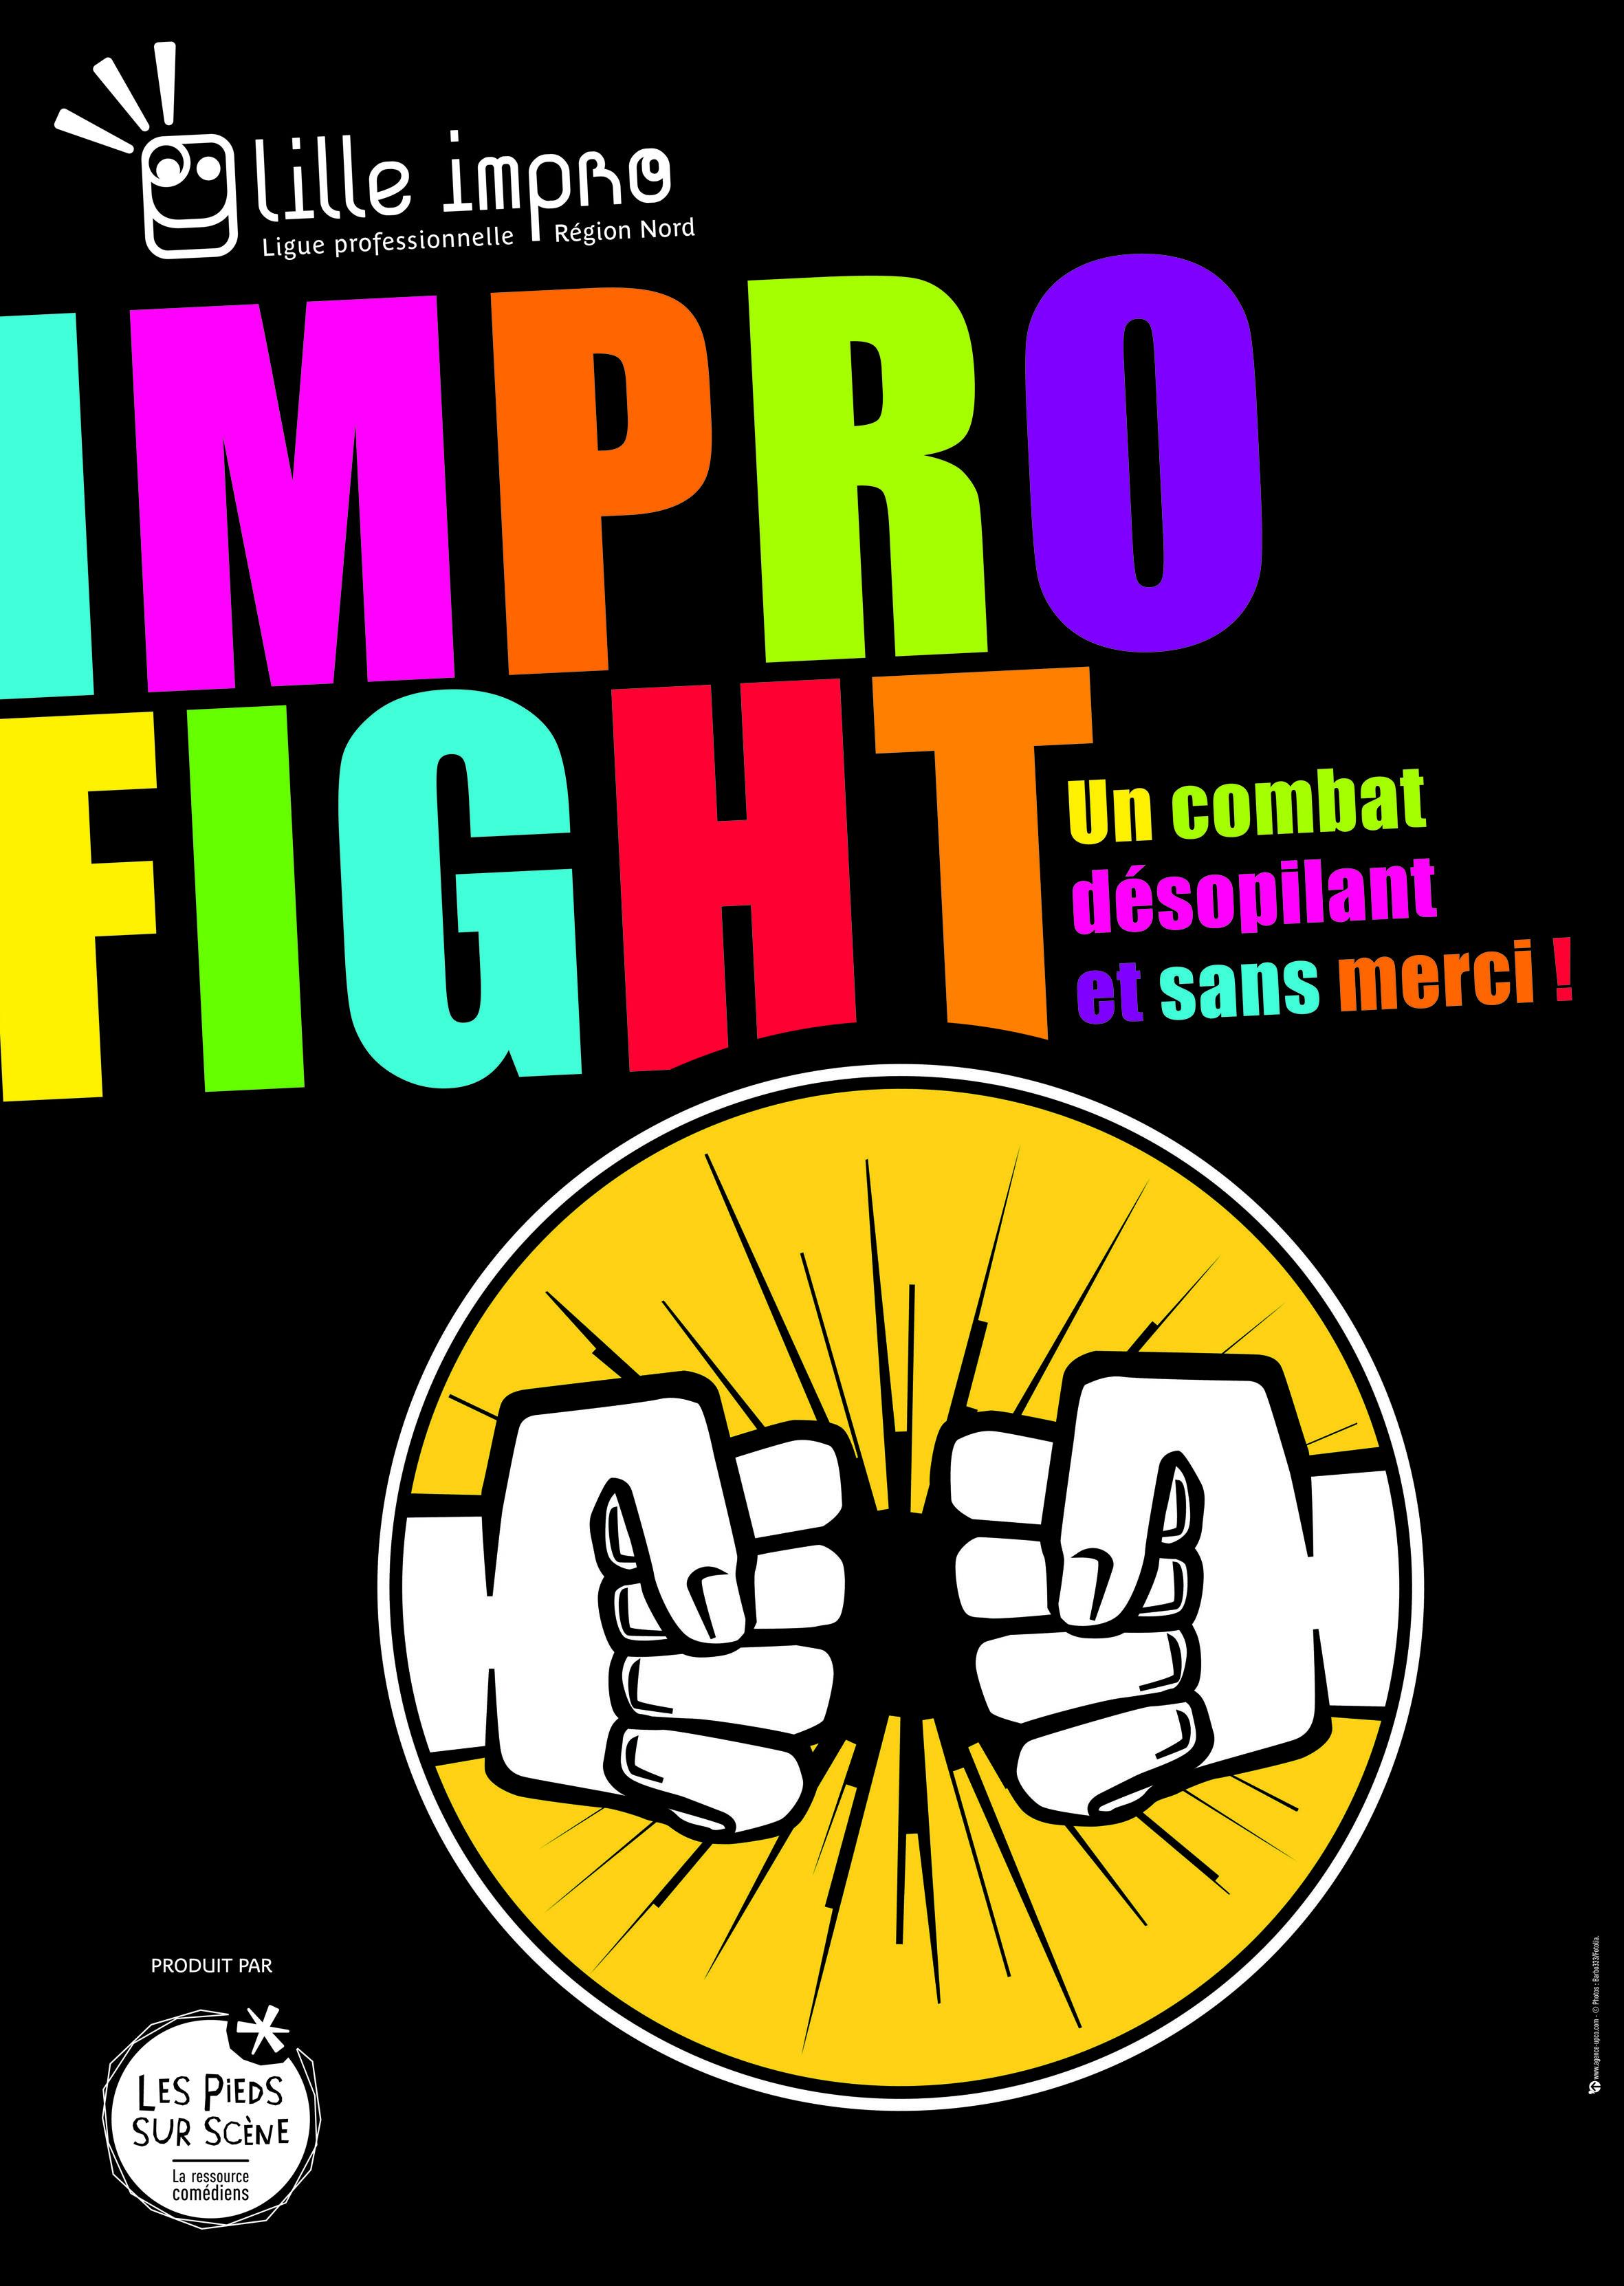 Impro fight avec Lille Impro